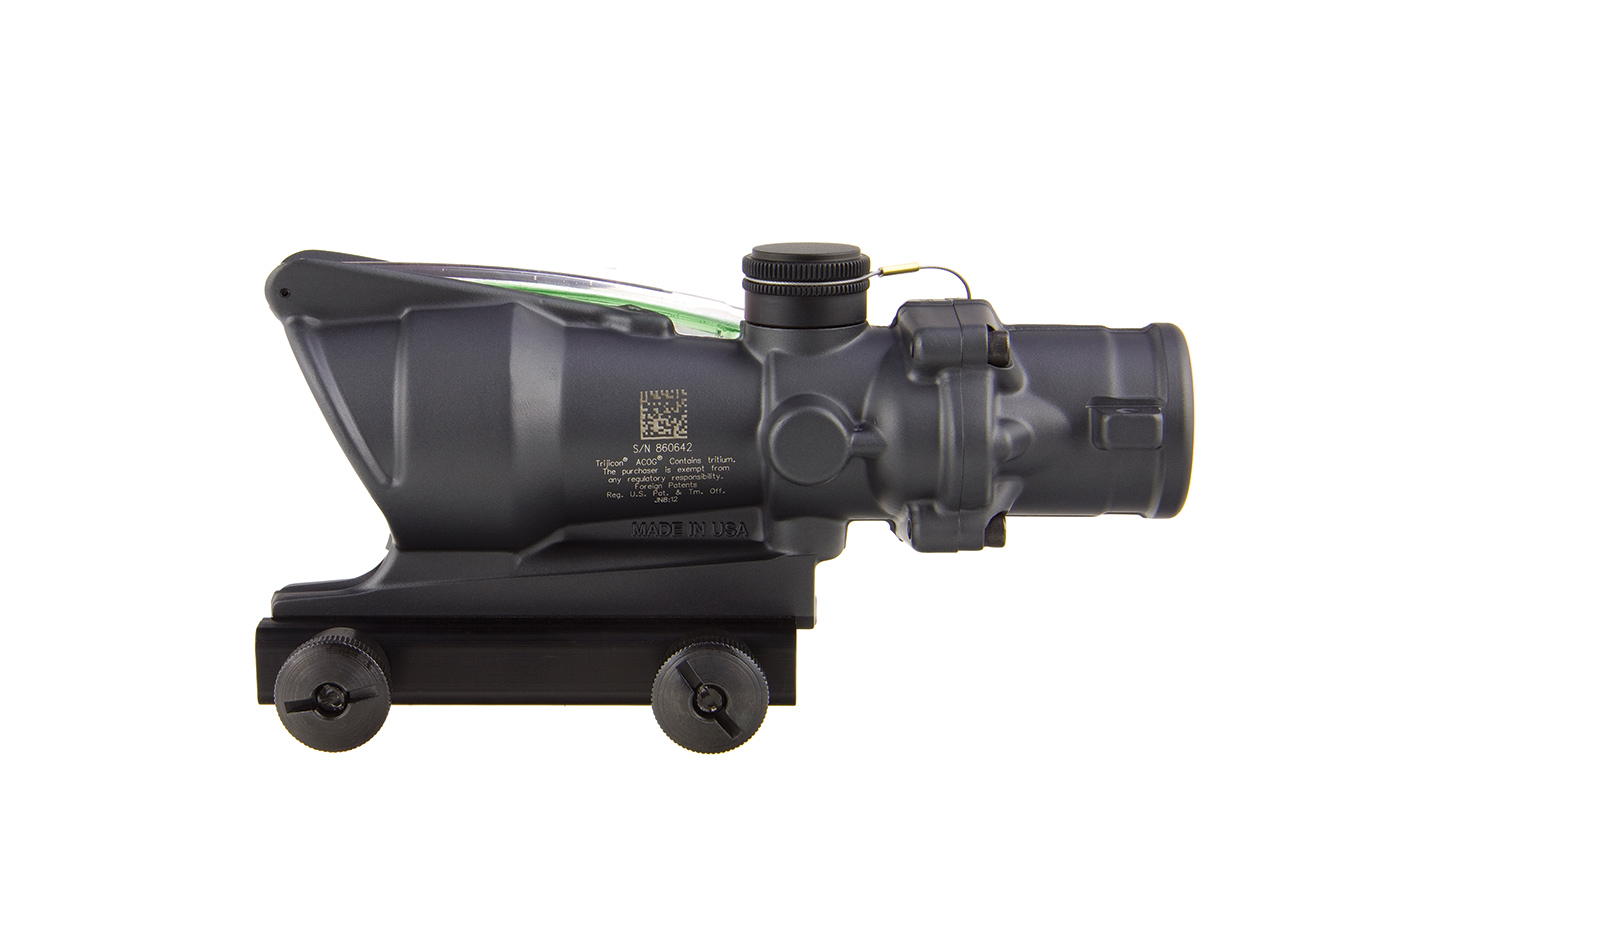 TA31-C-100378 angle 2